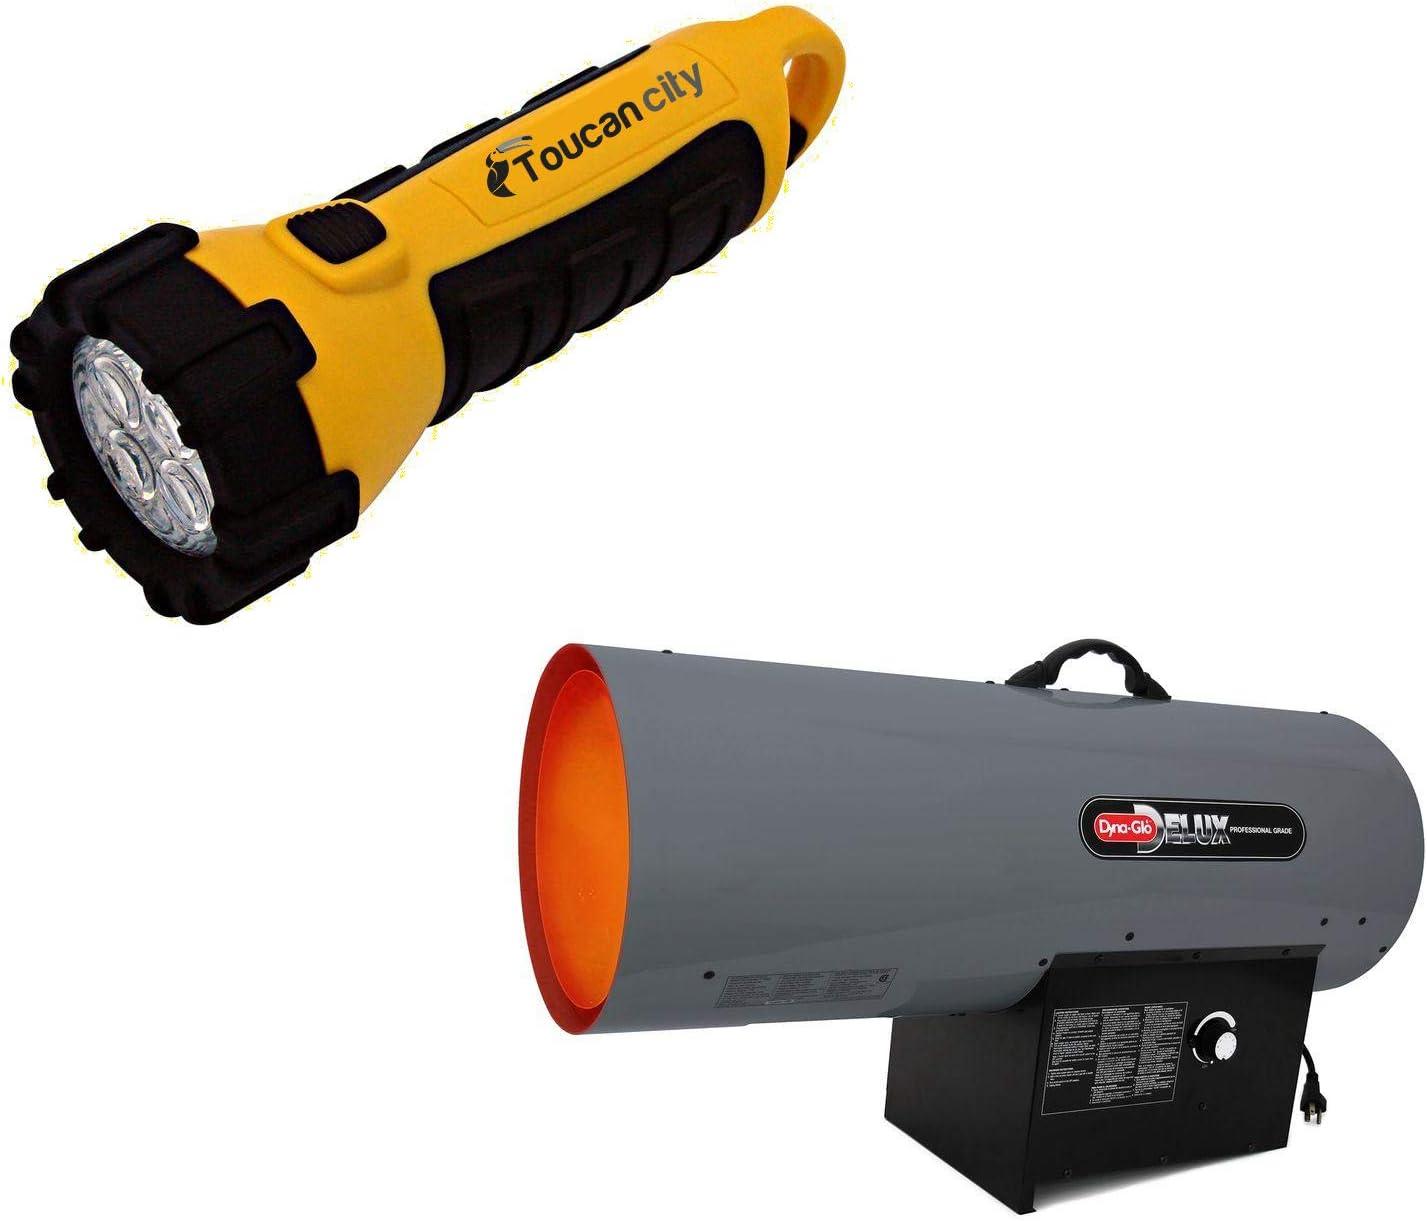 Toucan City LED Flashlight and Dyna-Glo Pro 30K-60K BTU Propane Forced Air Heater RMC-FA60DGP